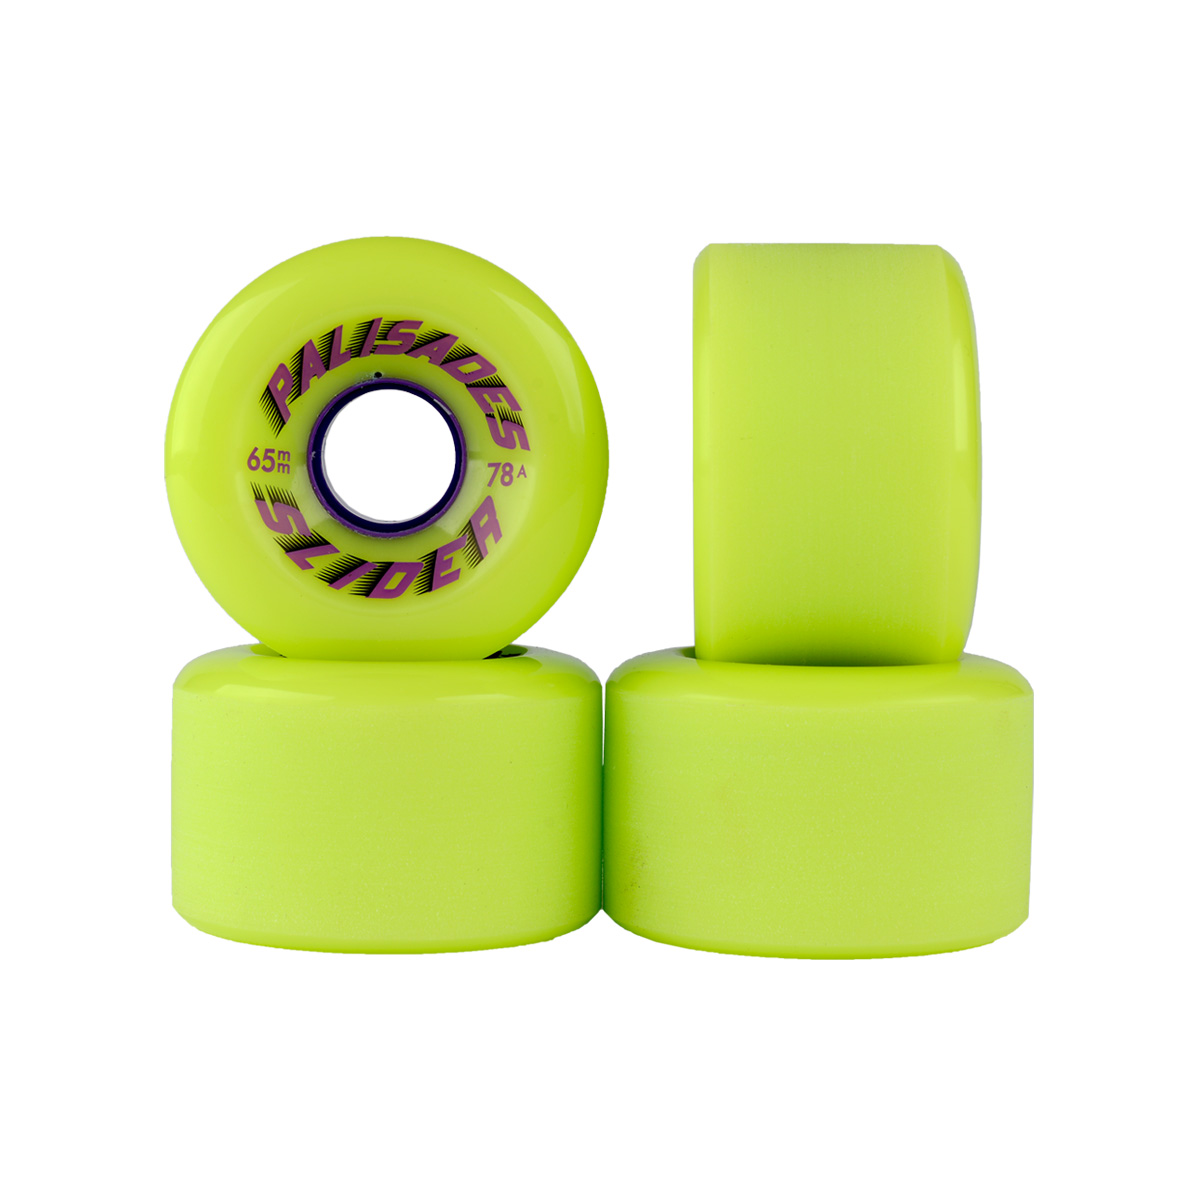 Stone ground center set w/radial edges. Lime